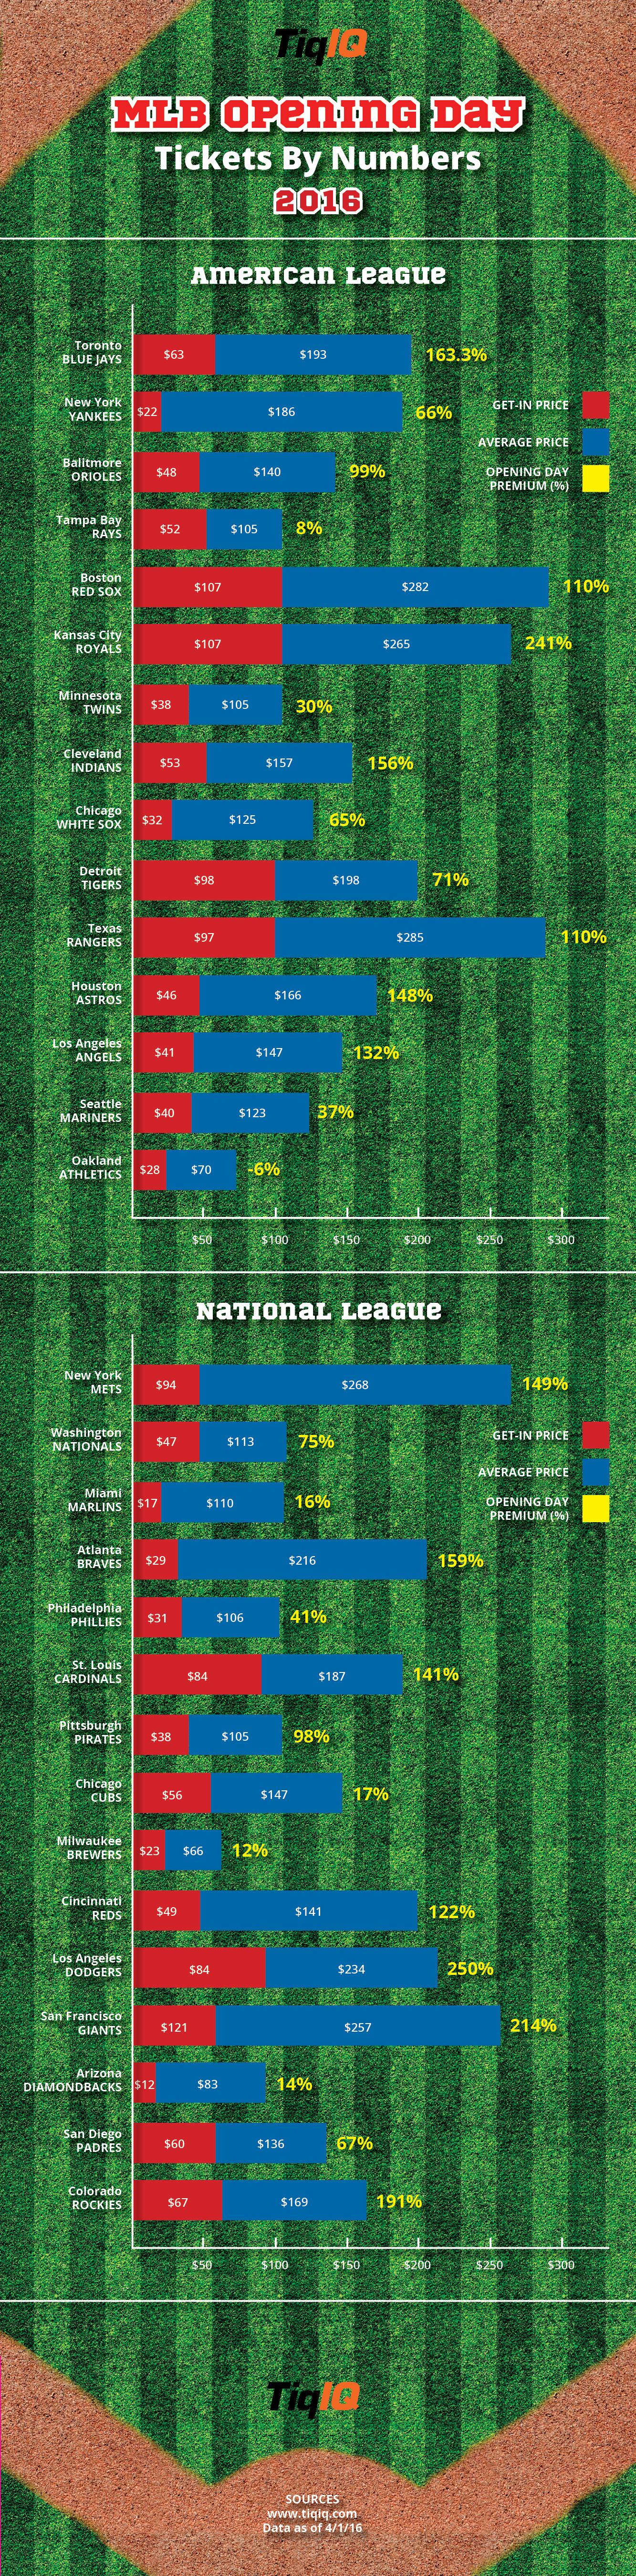 mlb_openingday_infographic.1 (1)